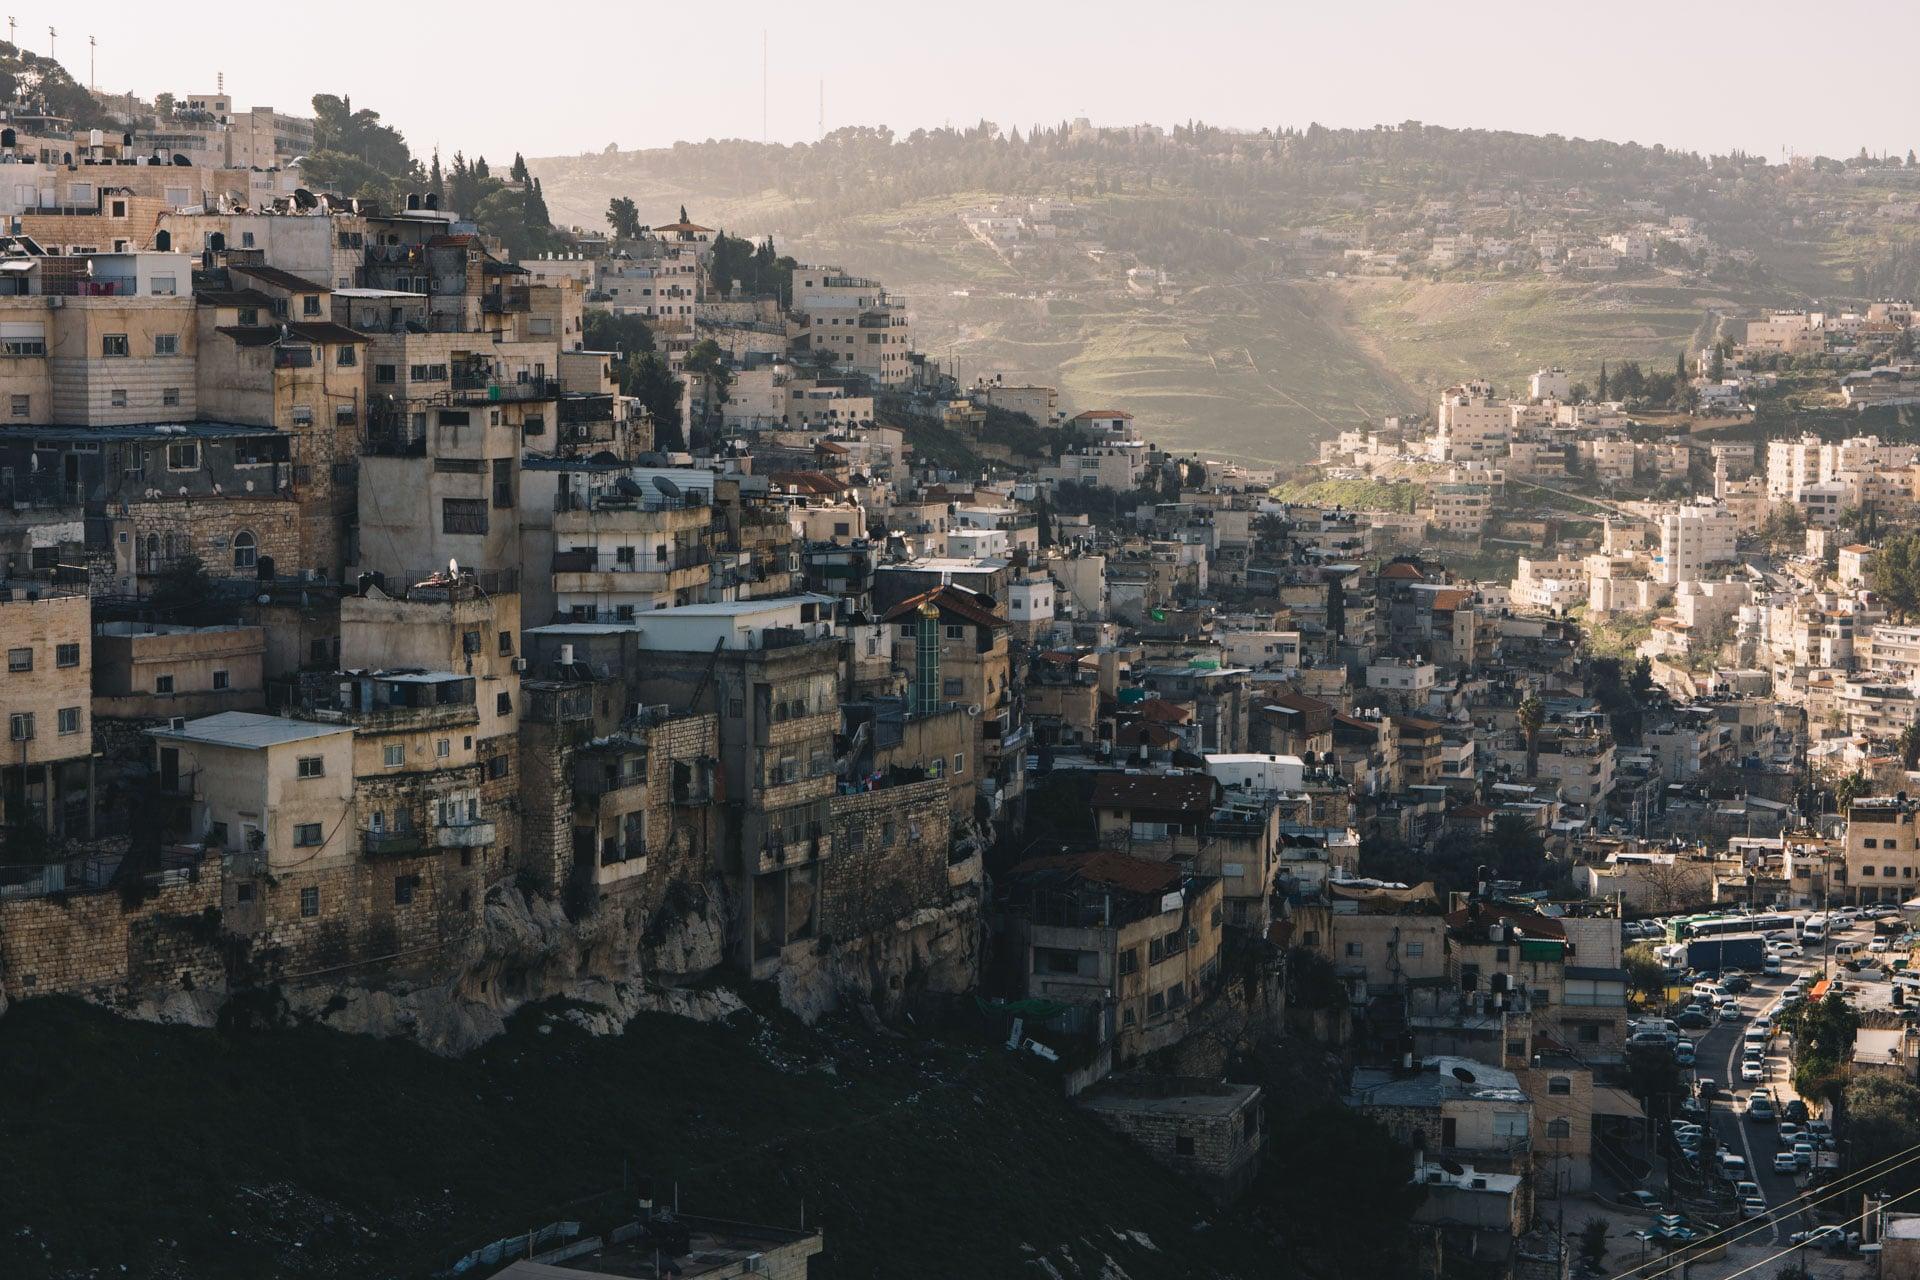 Jerozolima poza murami